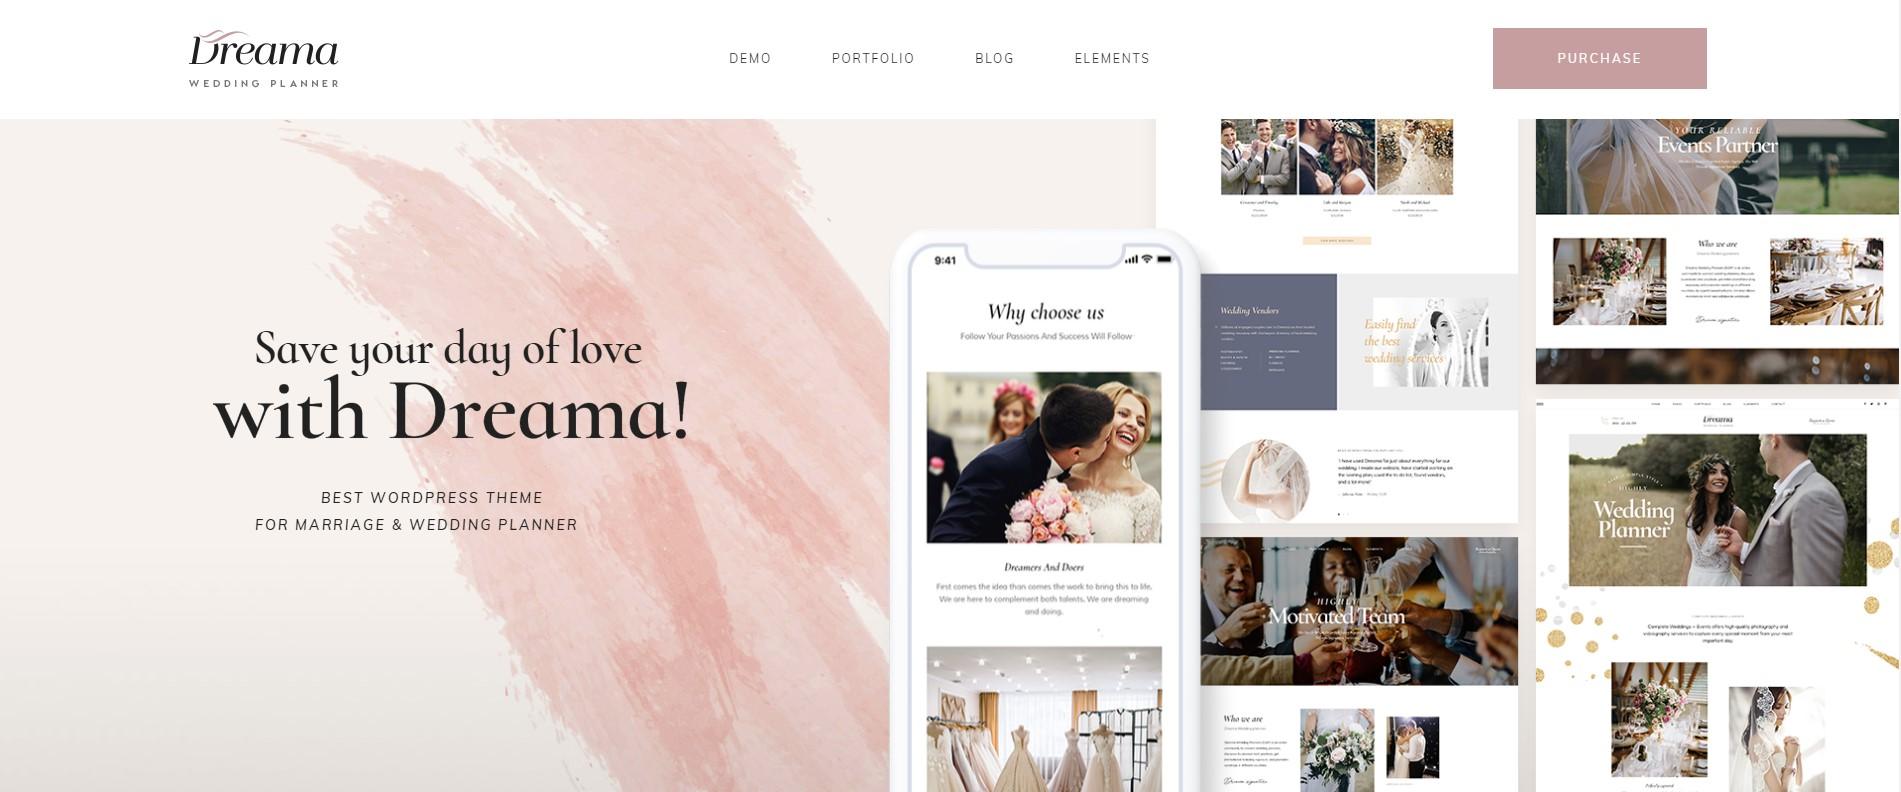 Dreama - Engagement & Wedding WordPress Theme